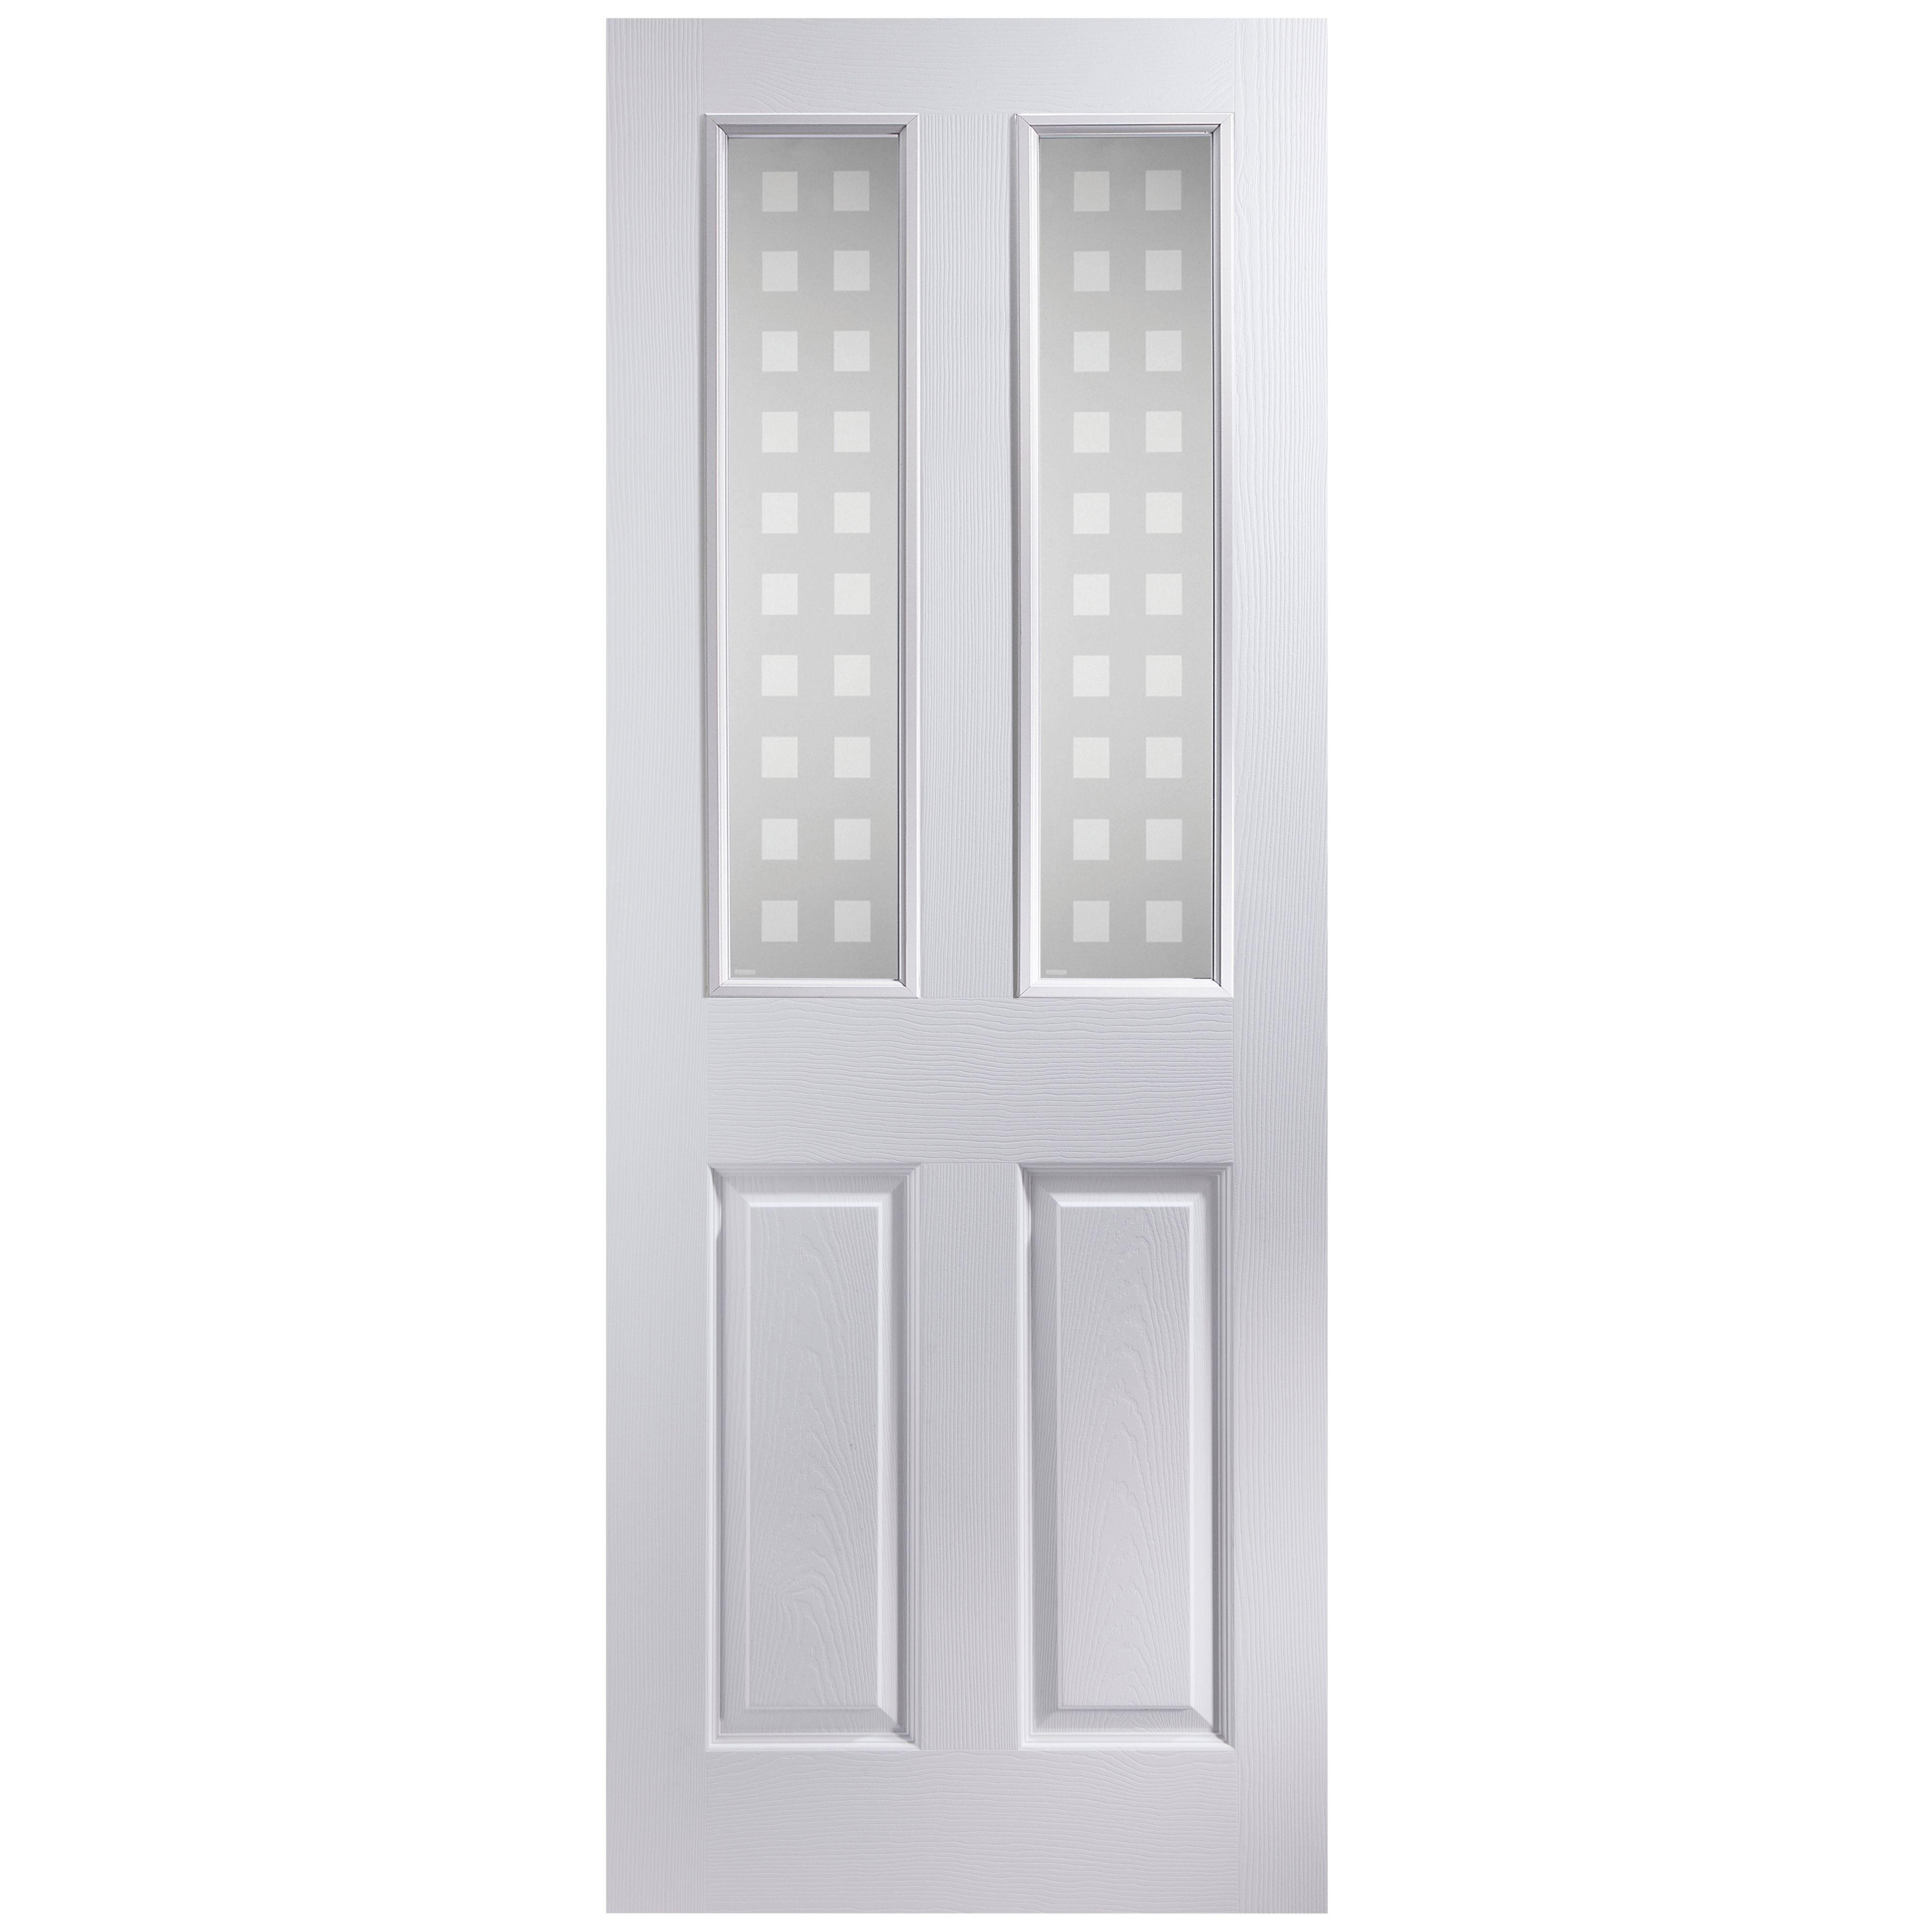 4 Panel Pre Painted White Woodgrain Glazed Internal Door H1981mm